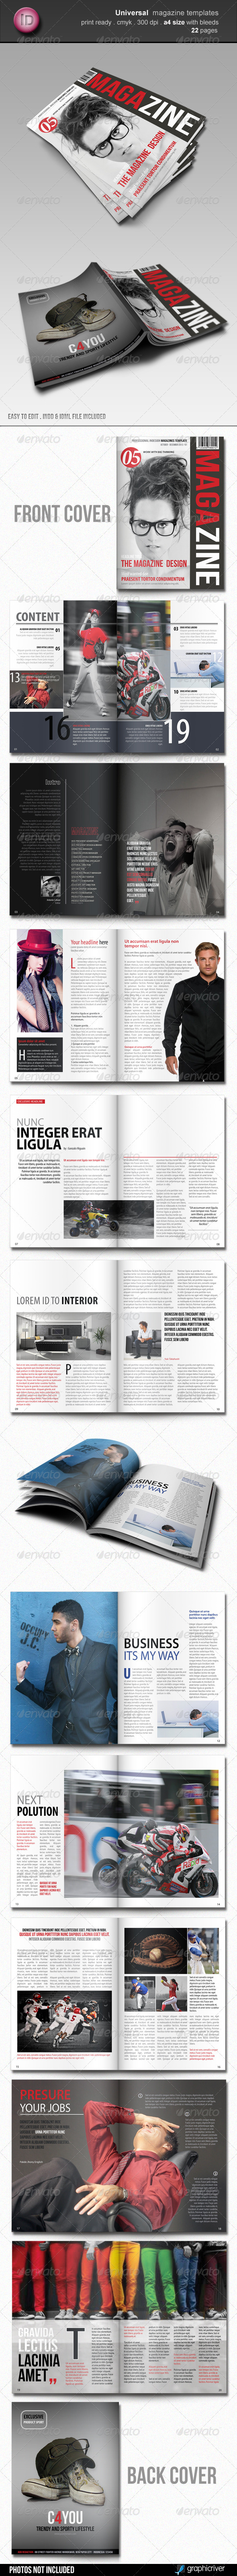 Universal Magazine Template - Magazines Print Templates